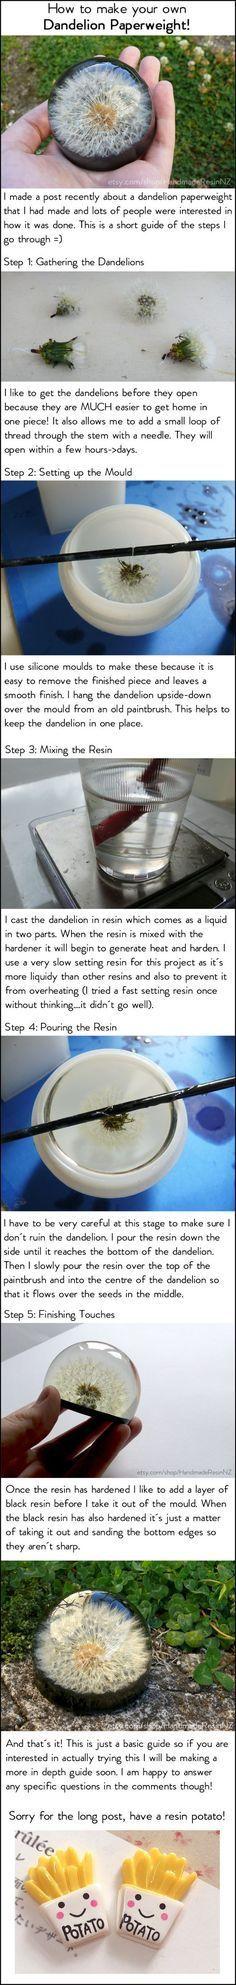 Dandelion paperweight tutorial!